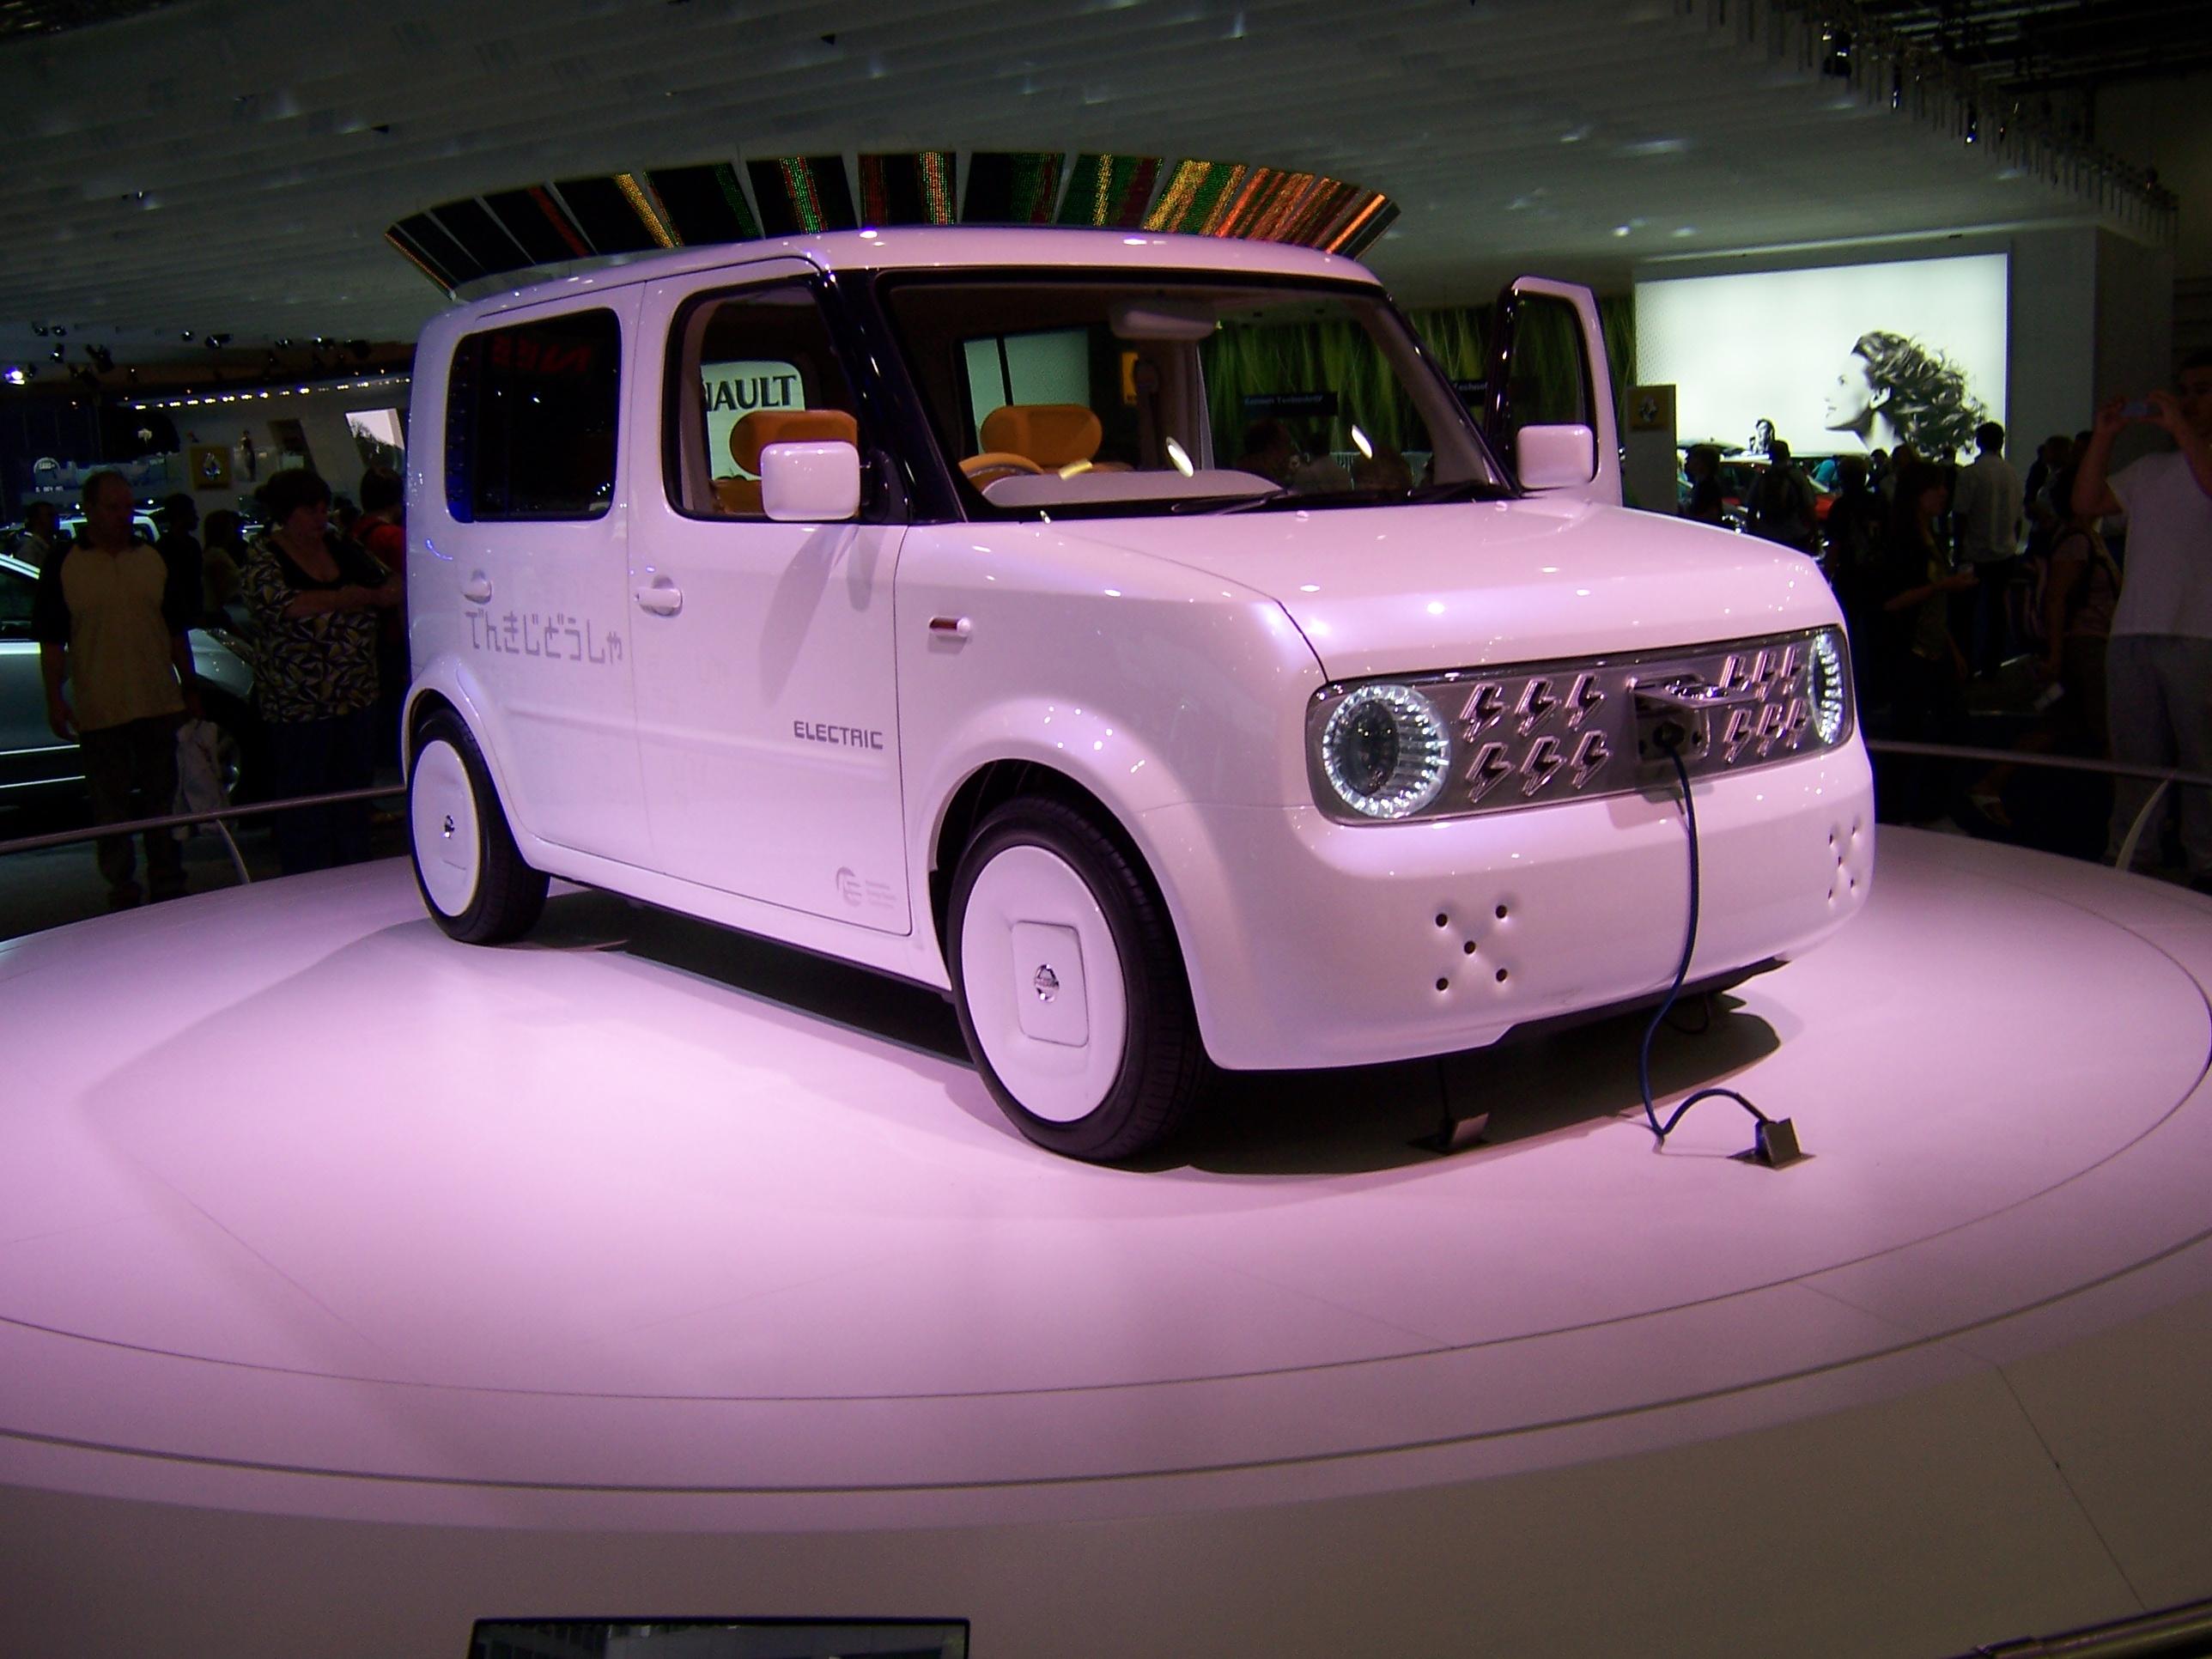 File Nissan Cube Electric Concept Flickr Alan D Jpg